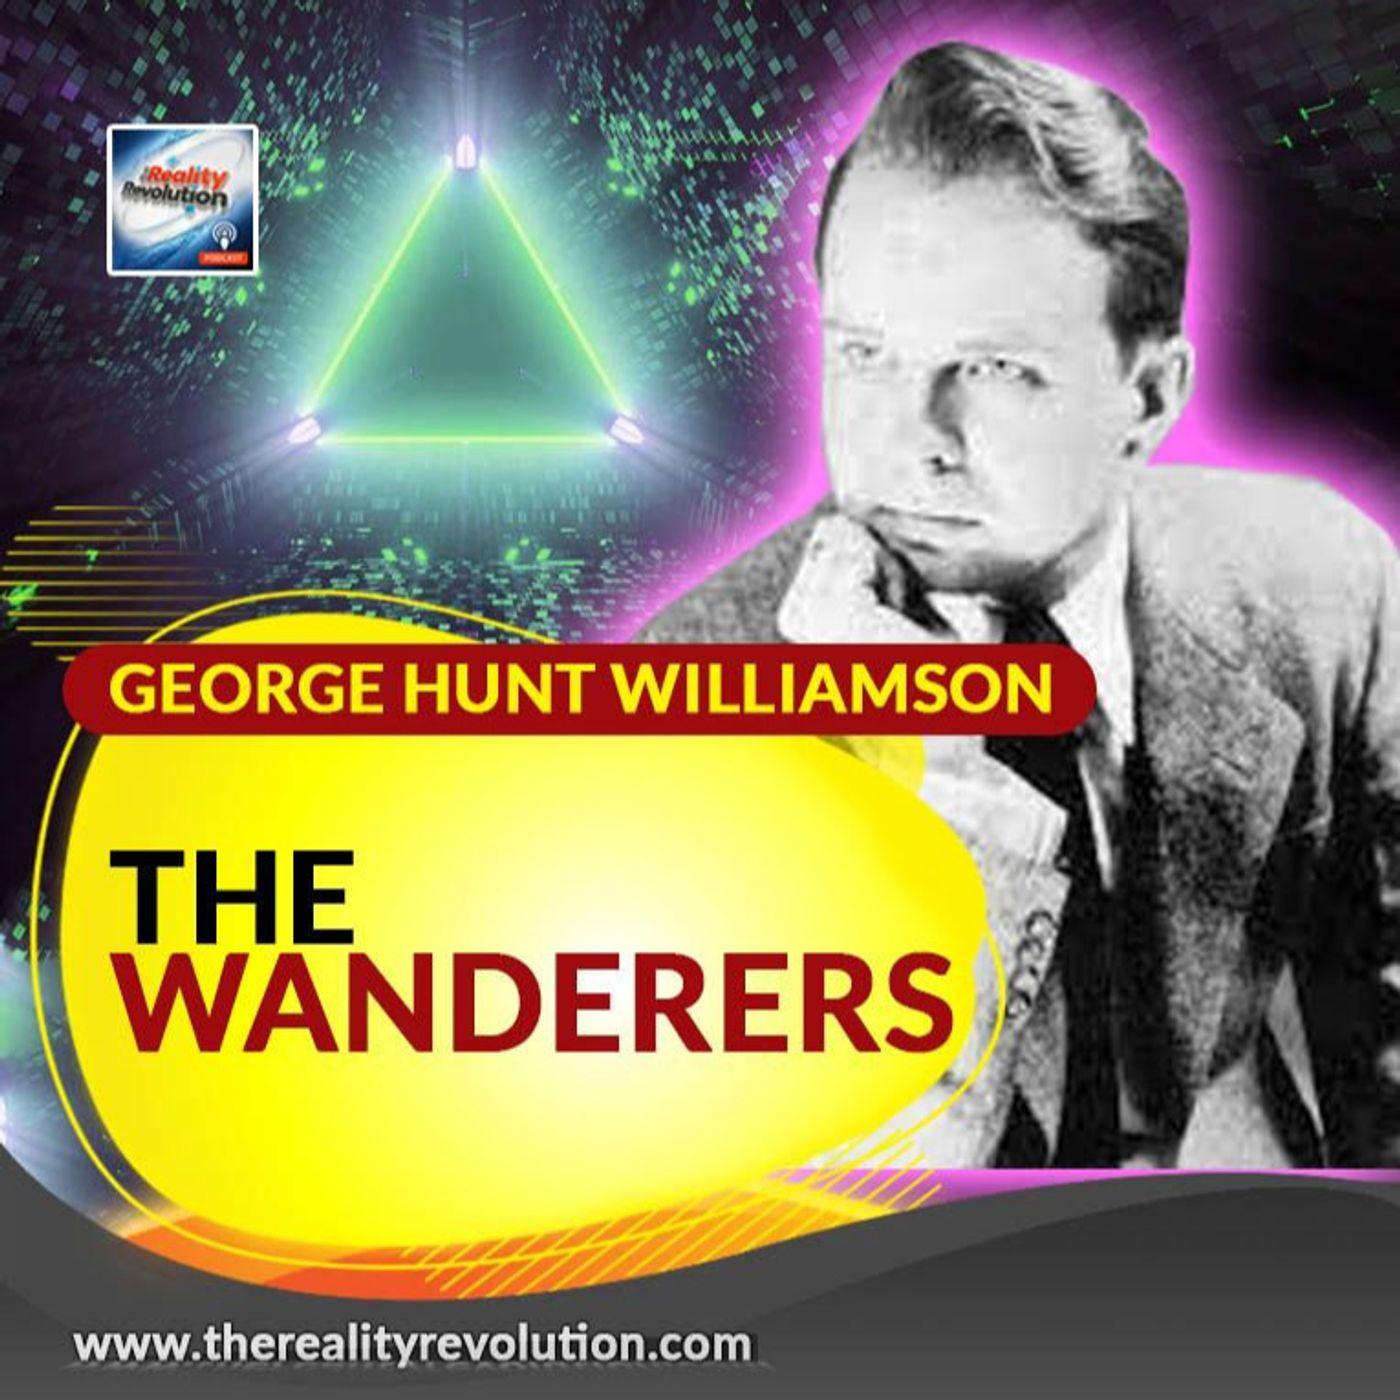 George Hunt Williamson - The Wanderers